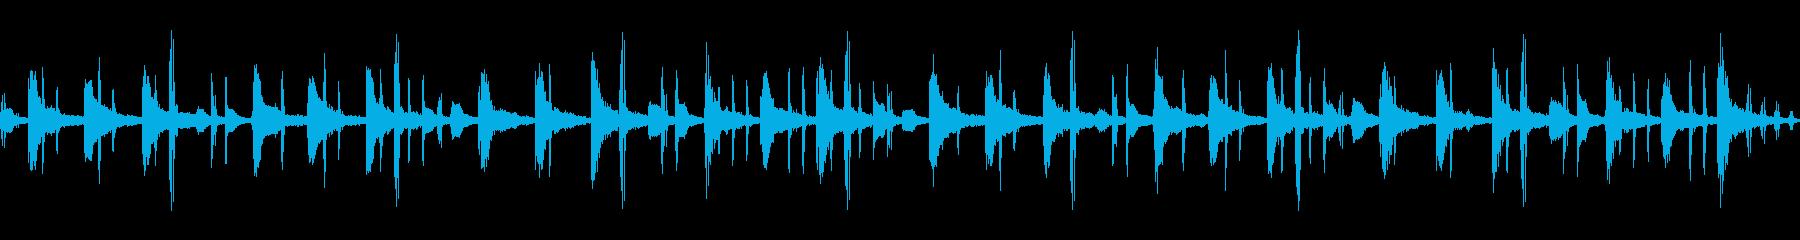 8-bar loop version pattern C's reproduced waveform